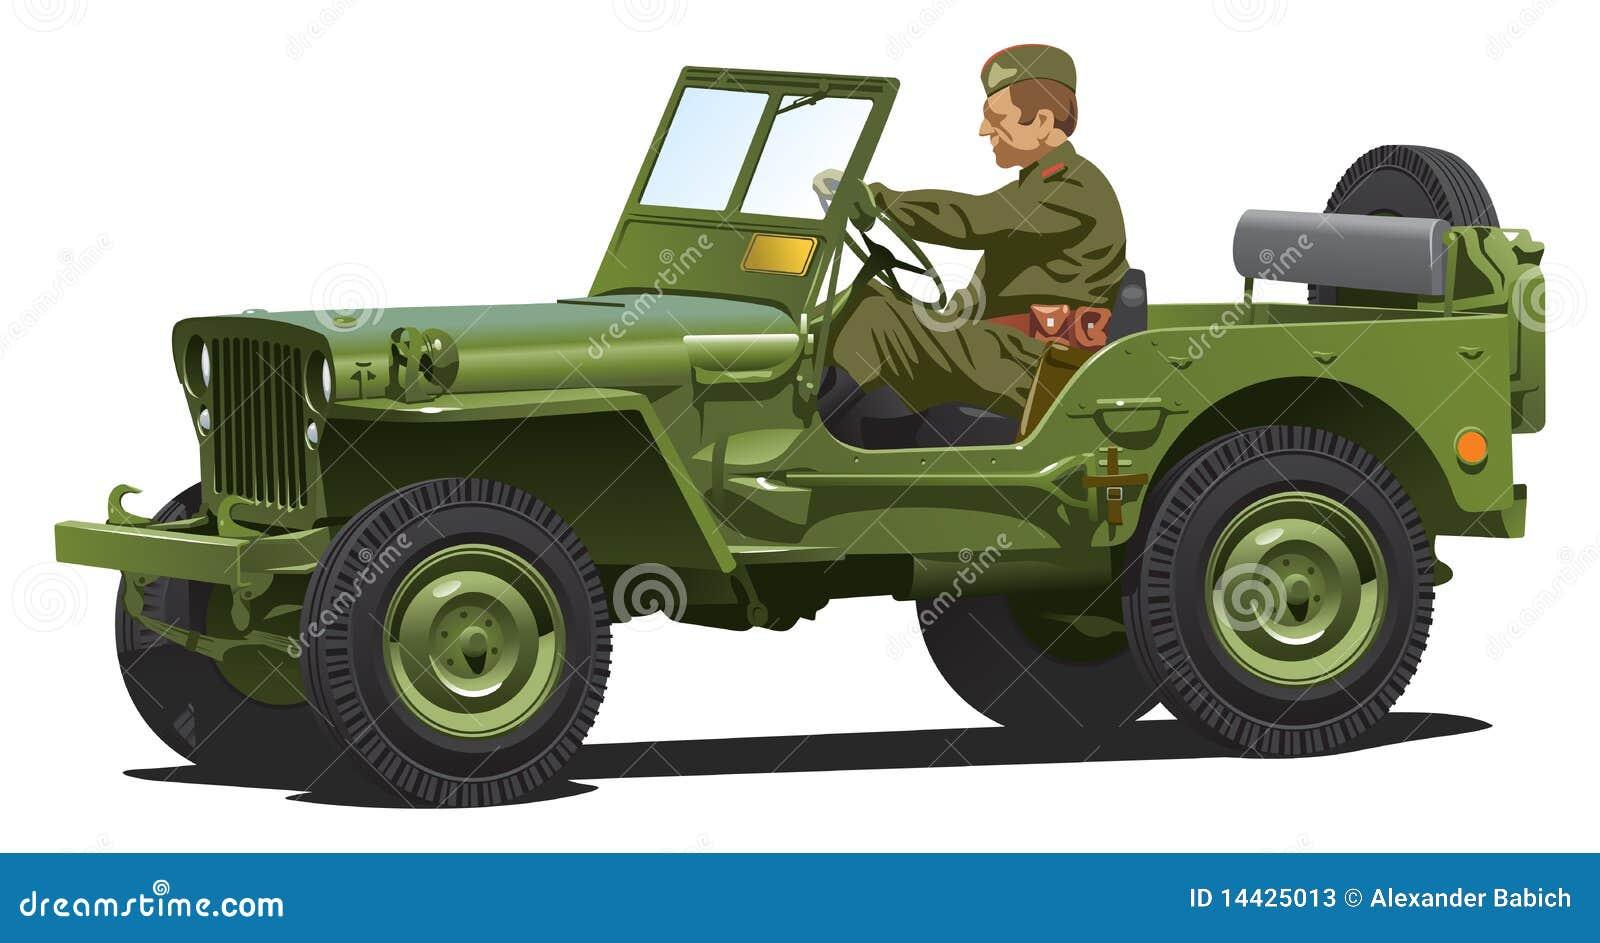 Jeep del ejército de la Segunda Guerra Mundial.